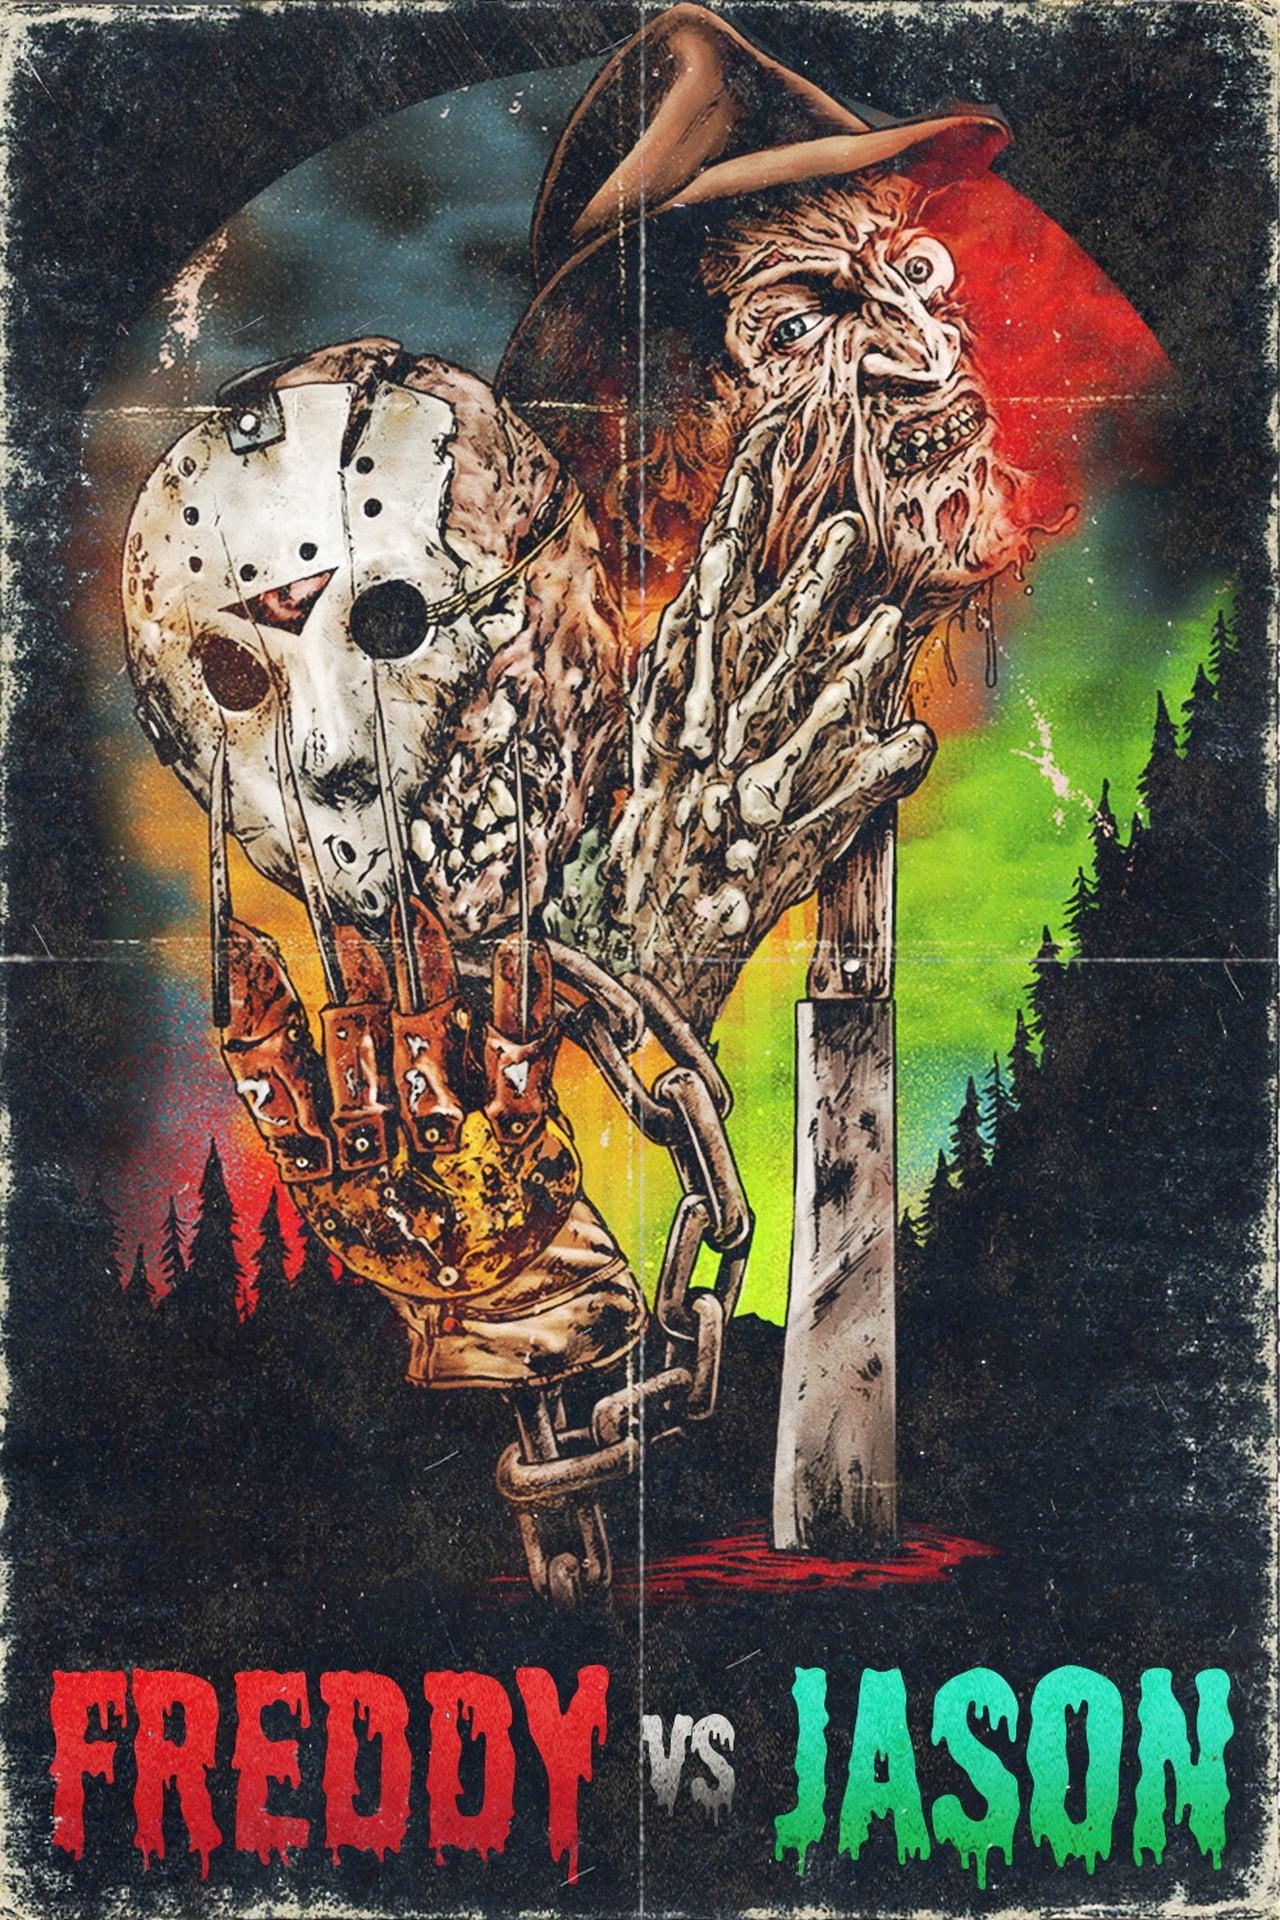 Freddy Vs. Jason - Horror Movies Image (22059690) - Fanpop